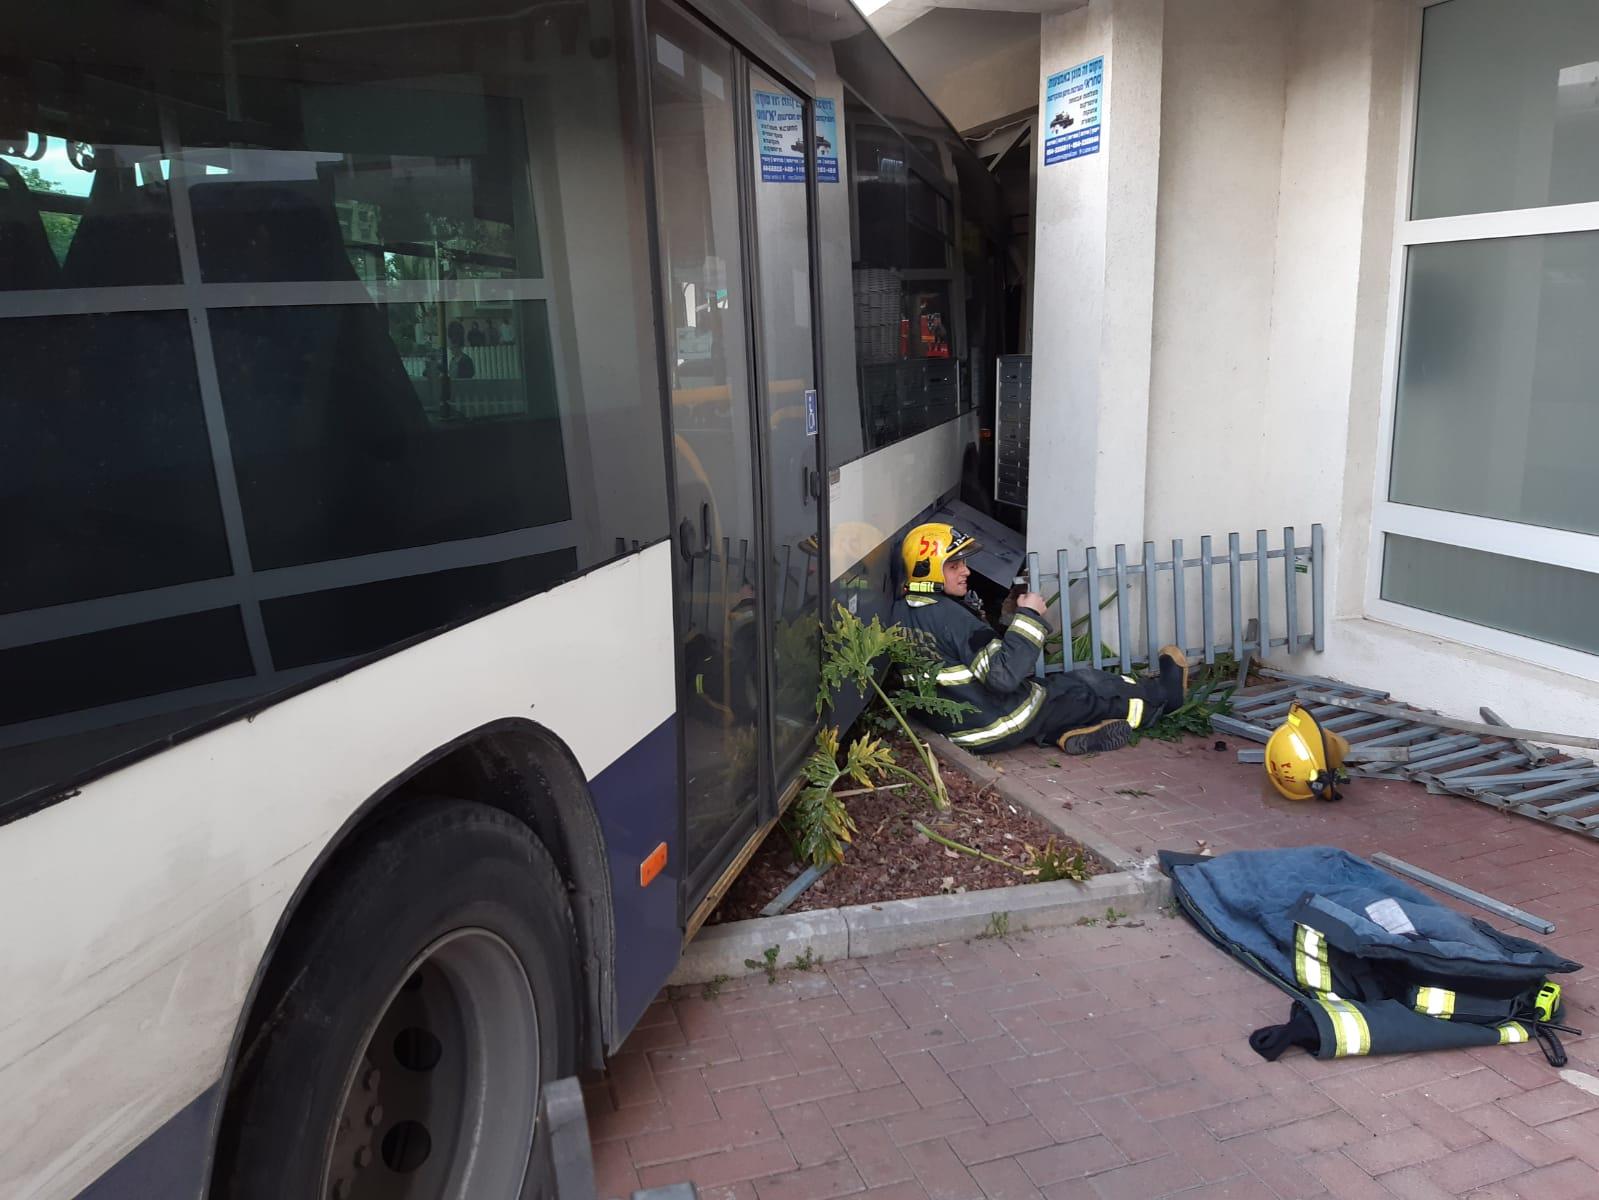 "Photo of אוטובוס איבד שליטה ברחוב אריה בן אליעזר בר""ג והתנגש בהולכי רגל שחלקם חולצו במצב קשה מתחת לגלגליו"